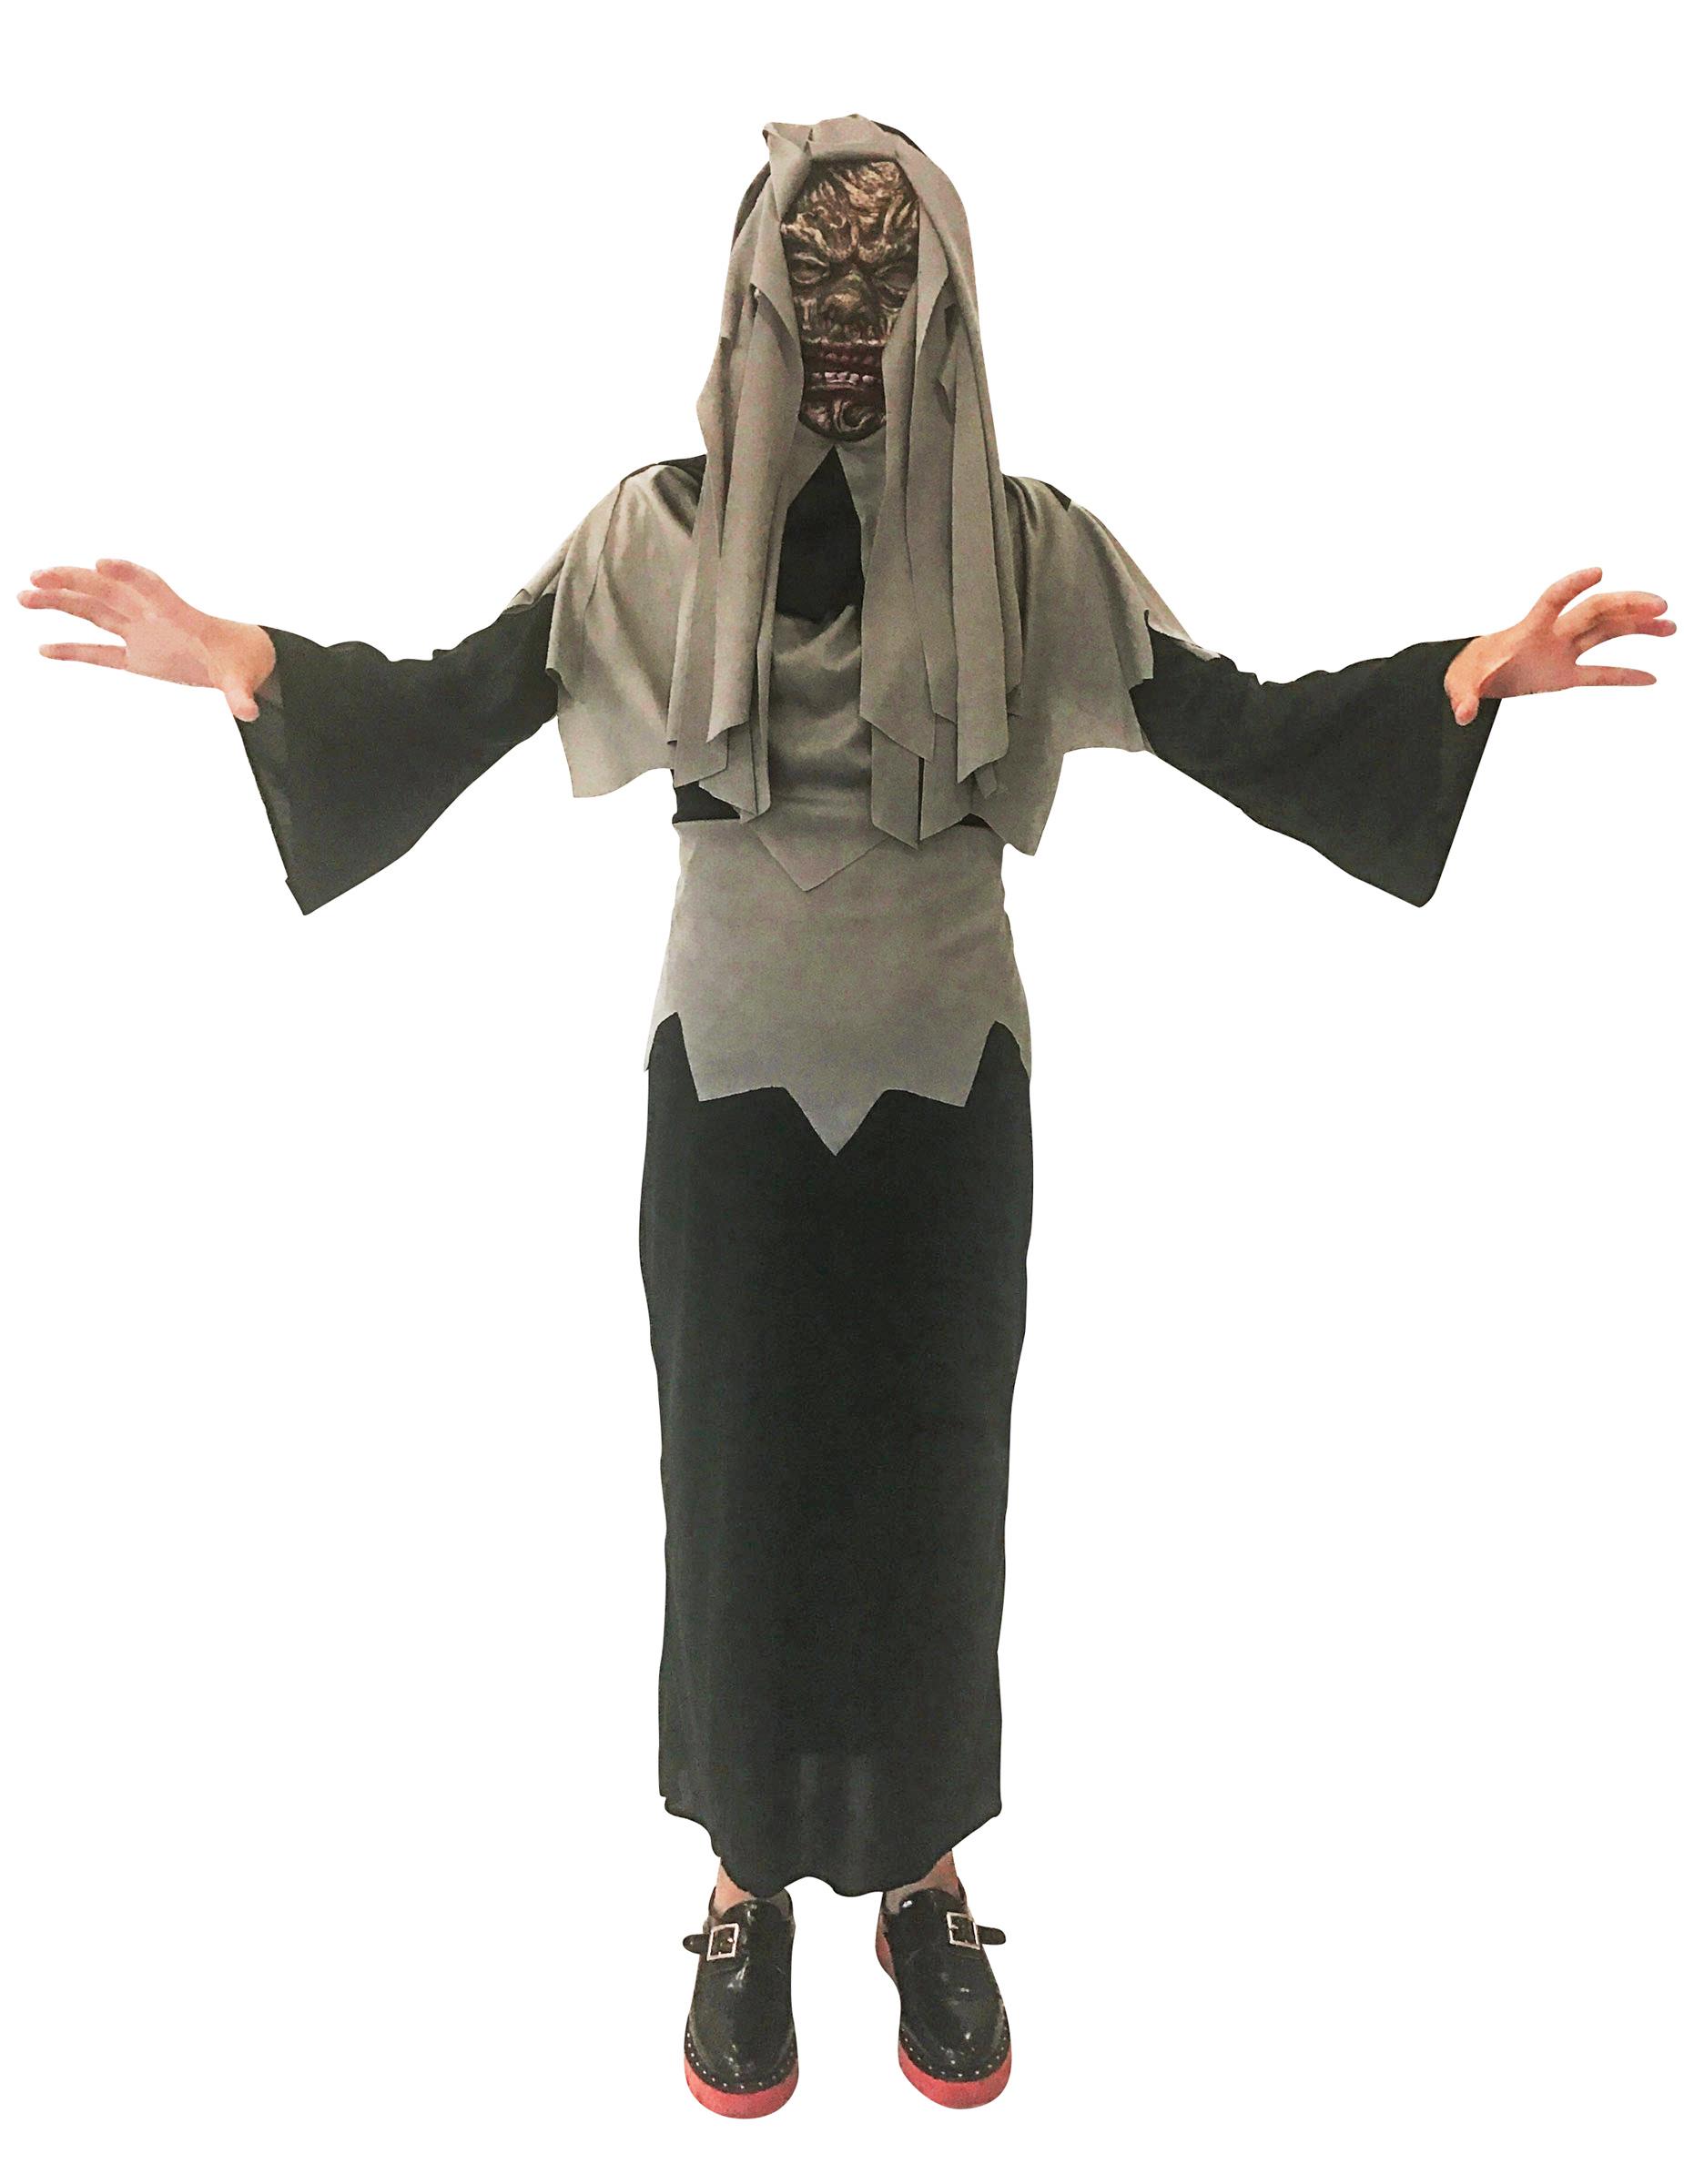 Monster Kostuem Fuer Jungen.Halloween Monster Kostum Fur Jungen Schreckliche Halloween Angebot Bei Vegaoo